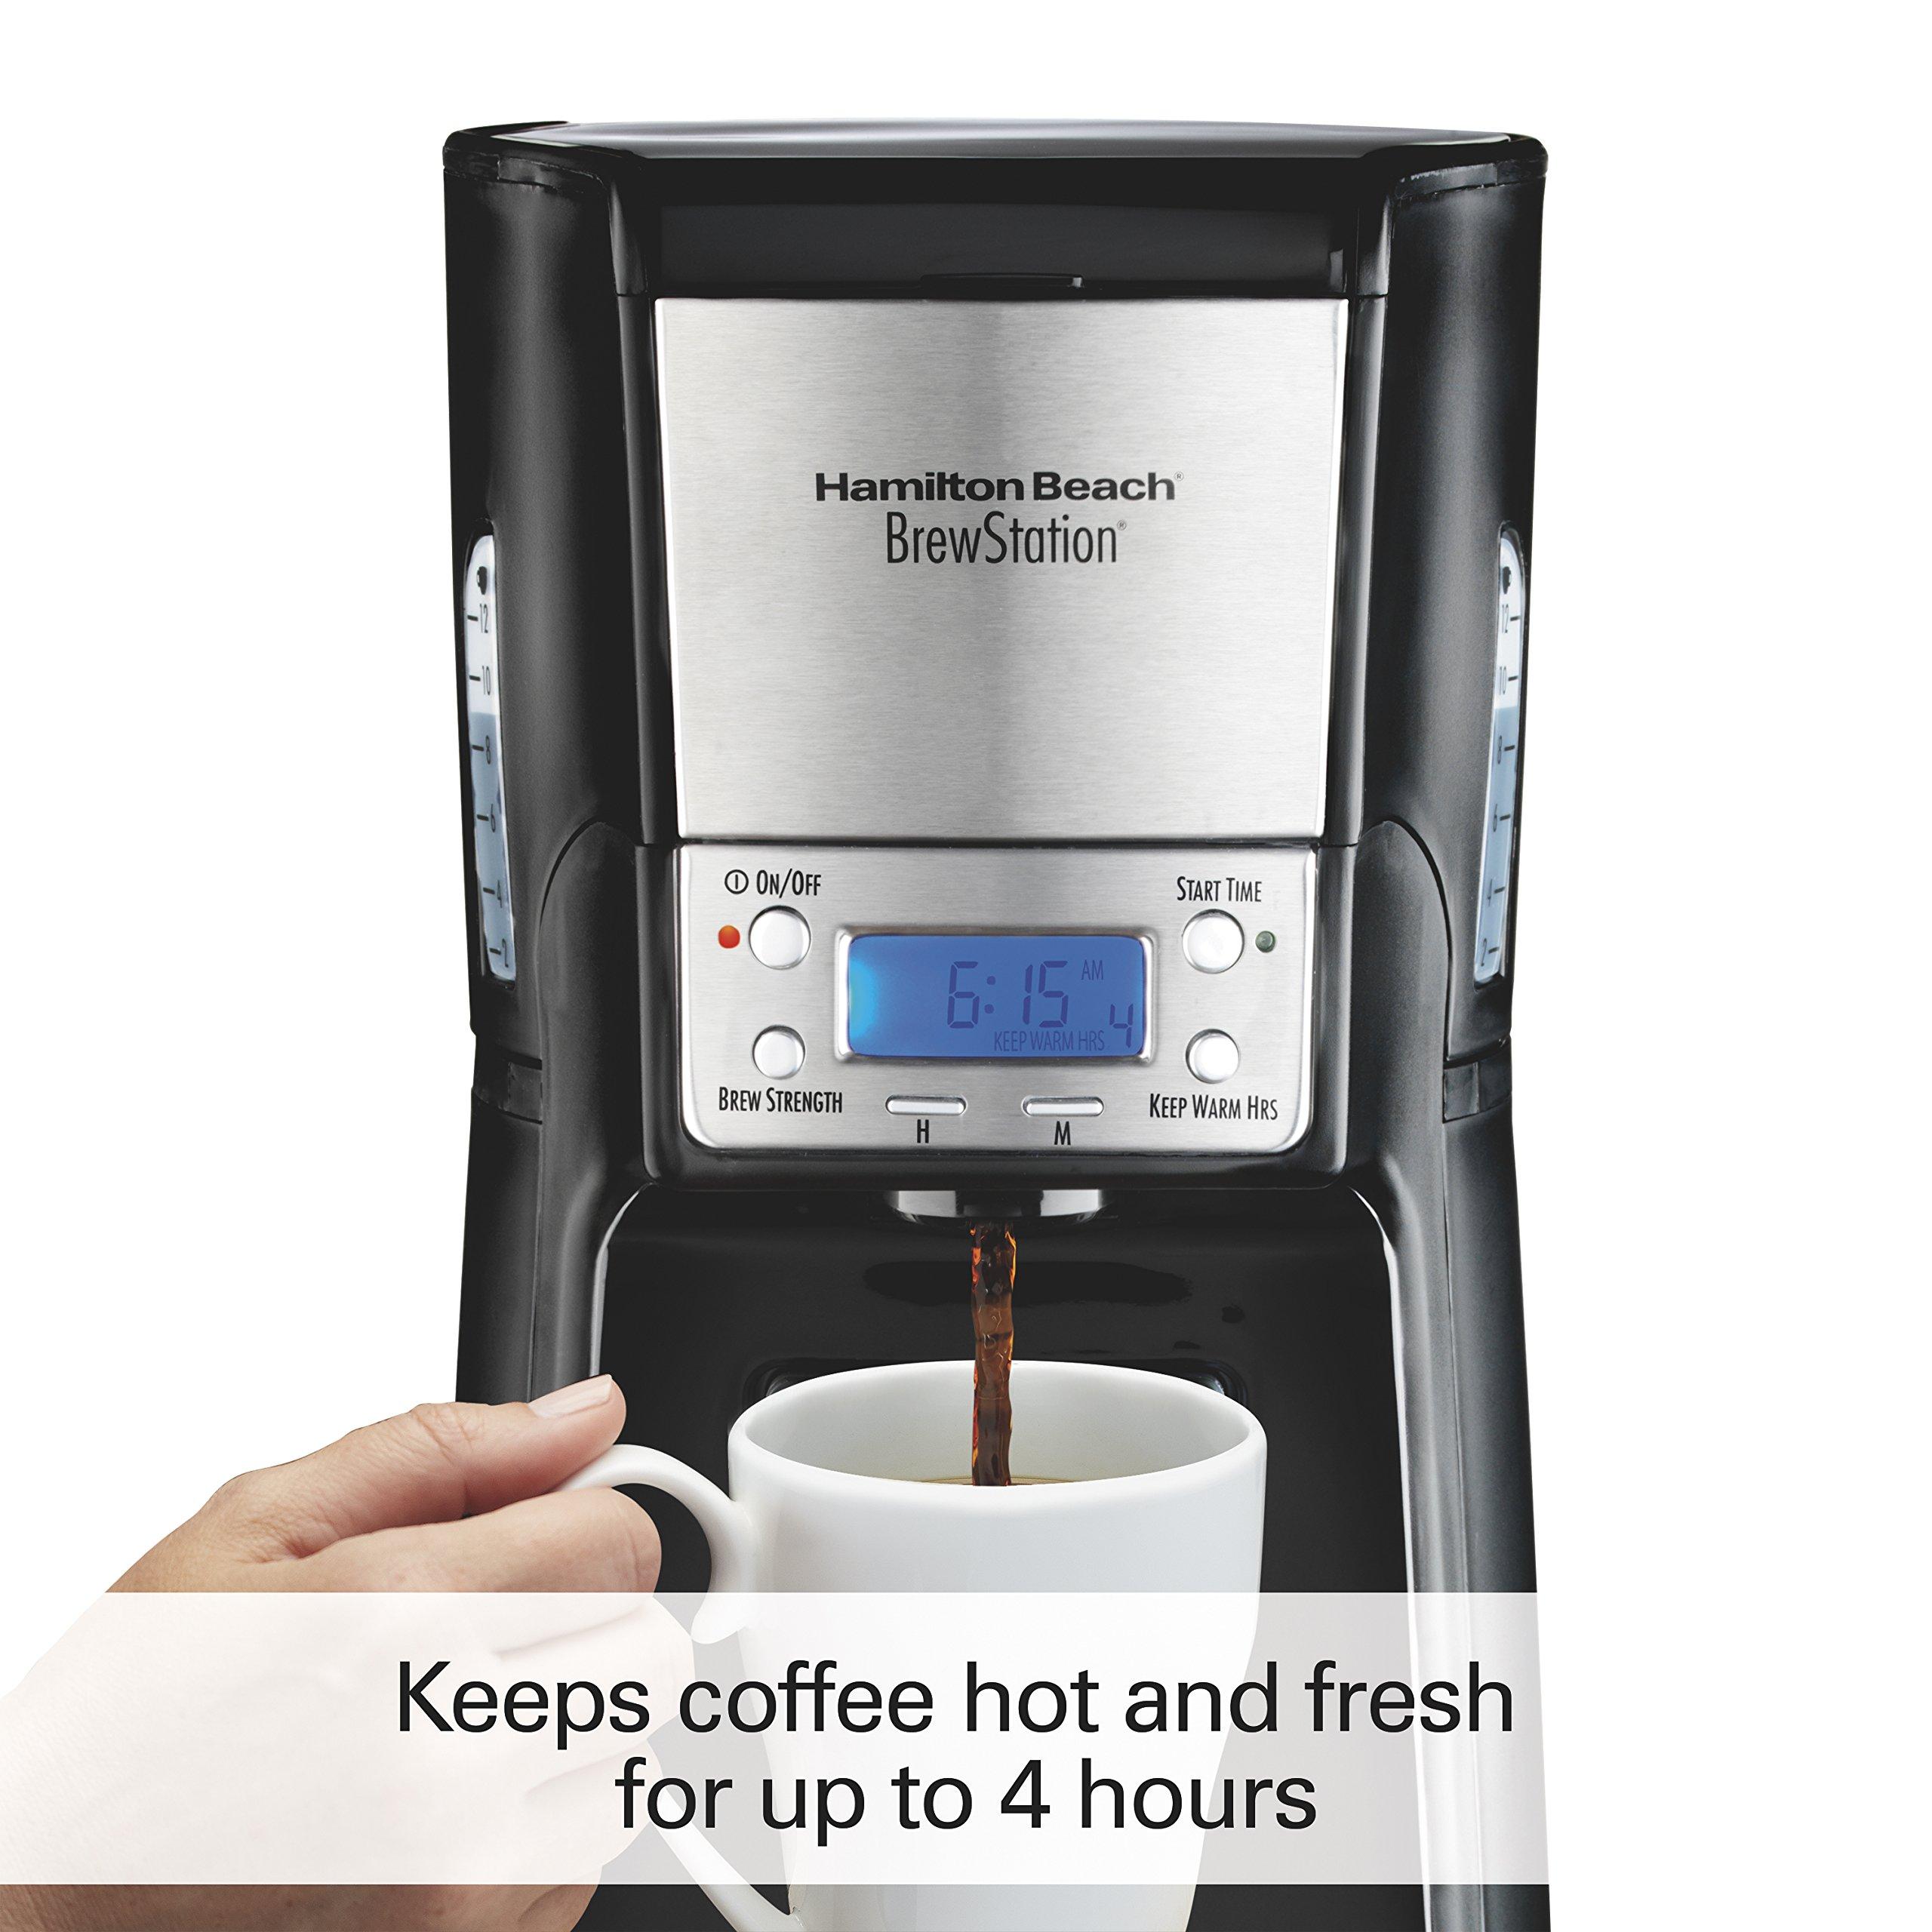 Hamilton Beach (48464) Coffee Maker with 12 Cup Capacity & Internal Storage Coffee Pot, Brewstation, Black by Hamilton Beach (Image #3)